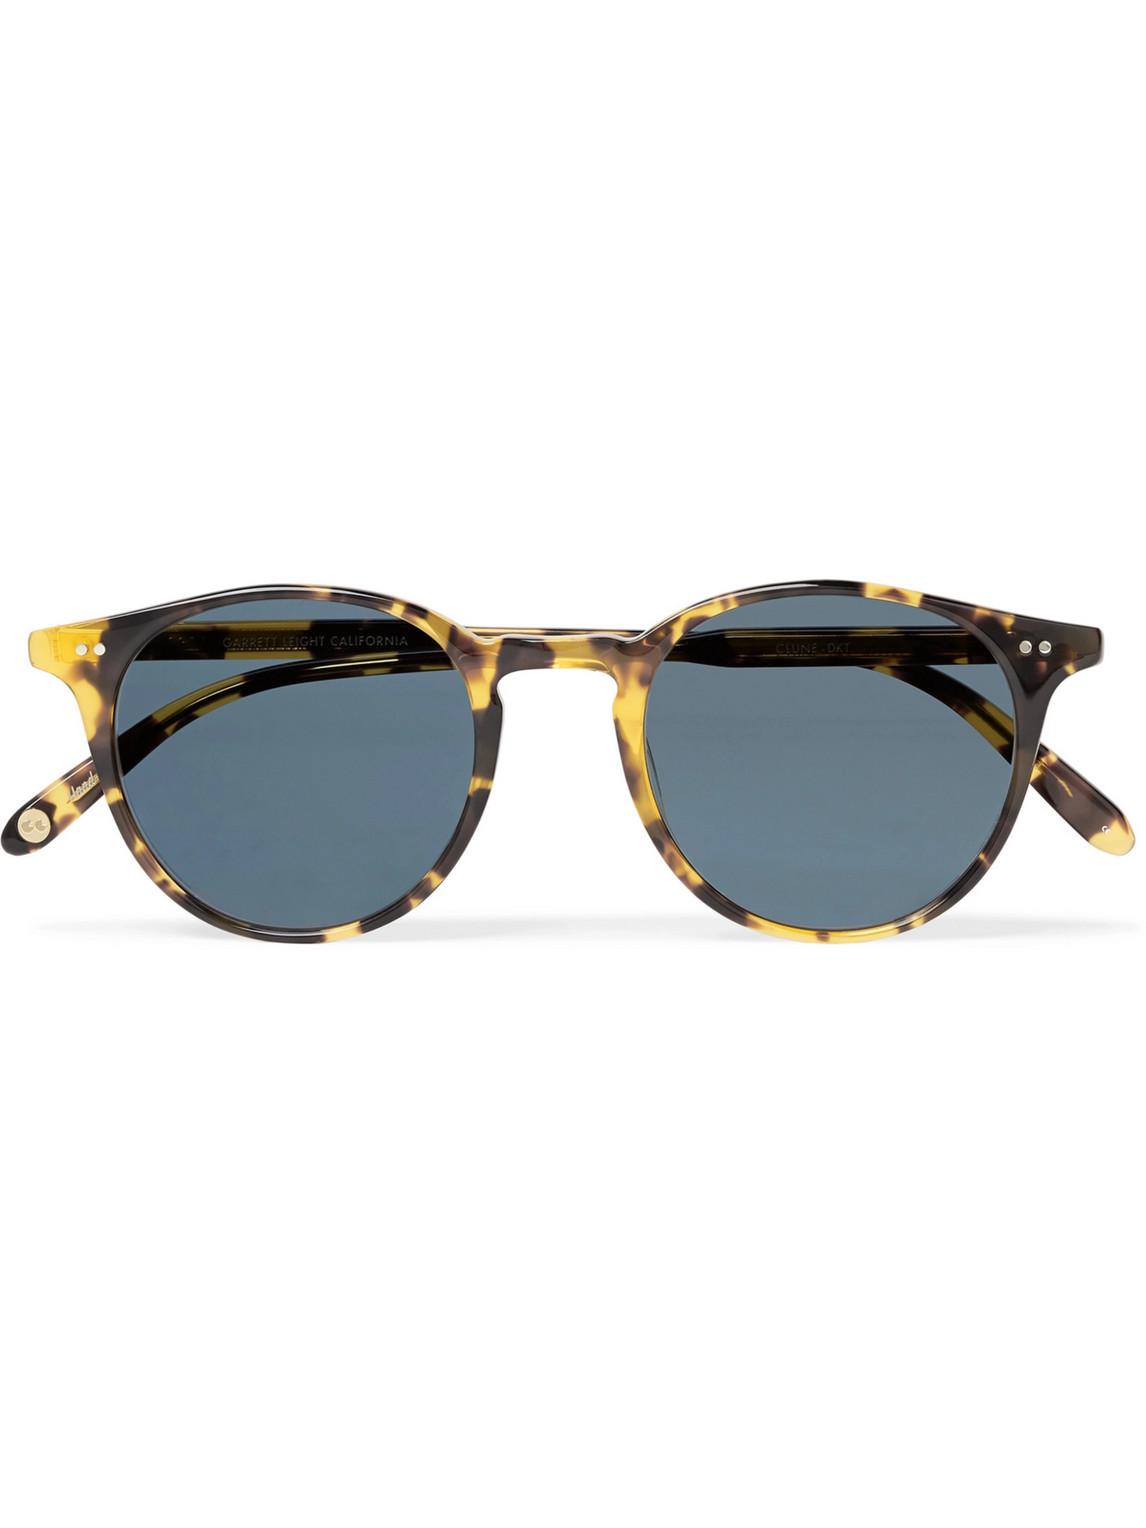 garrett leight california optical - clune round-frame tortoiseshell acetate sunglasses - men - brown